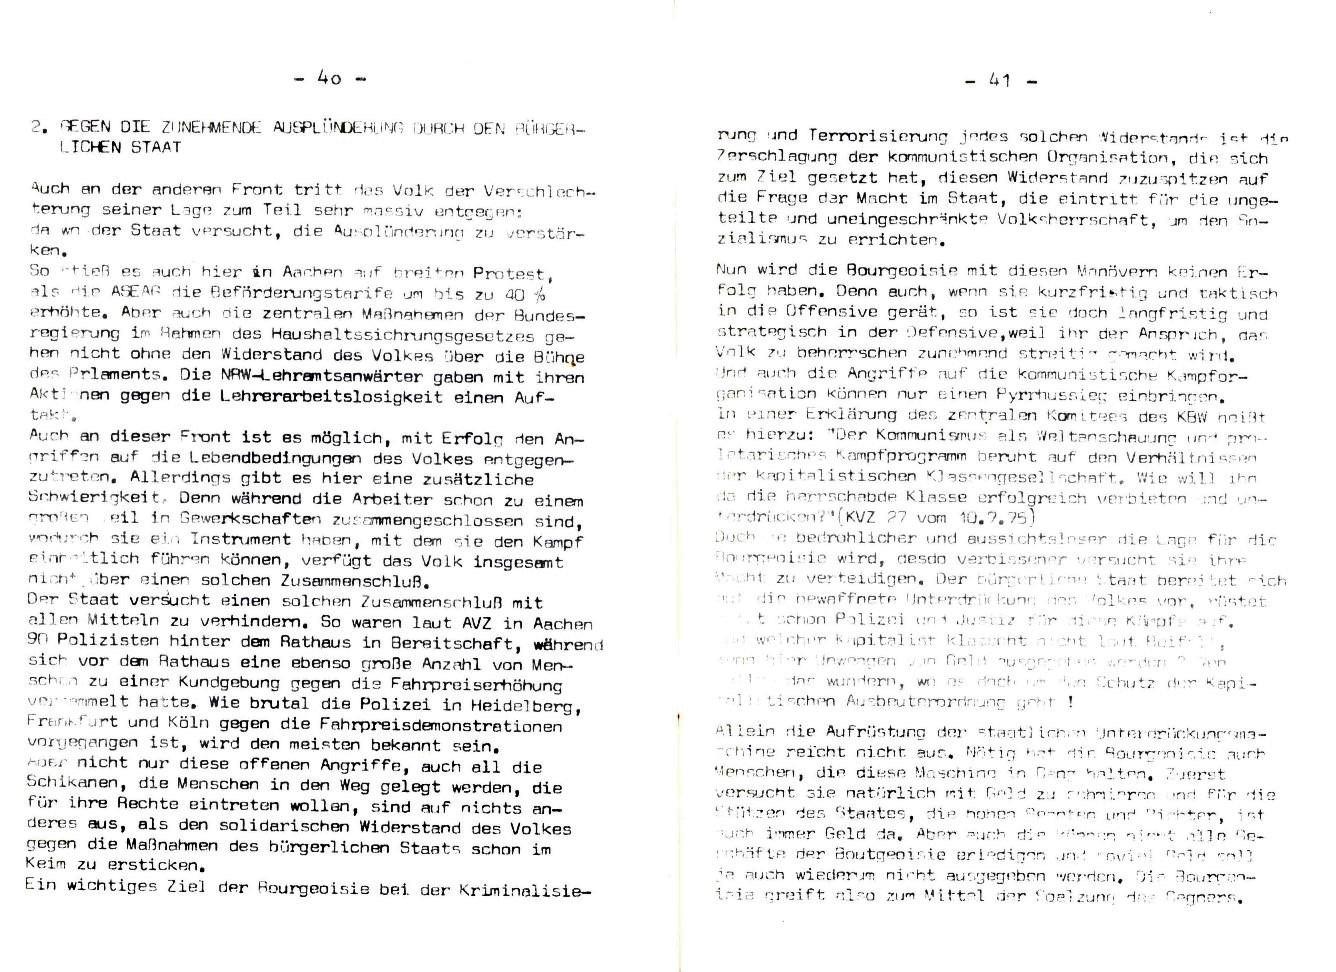 Aachen_KHI_1975_Krise_21